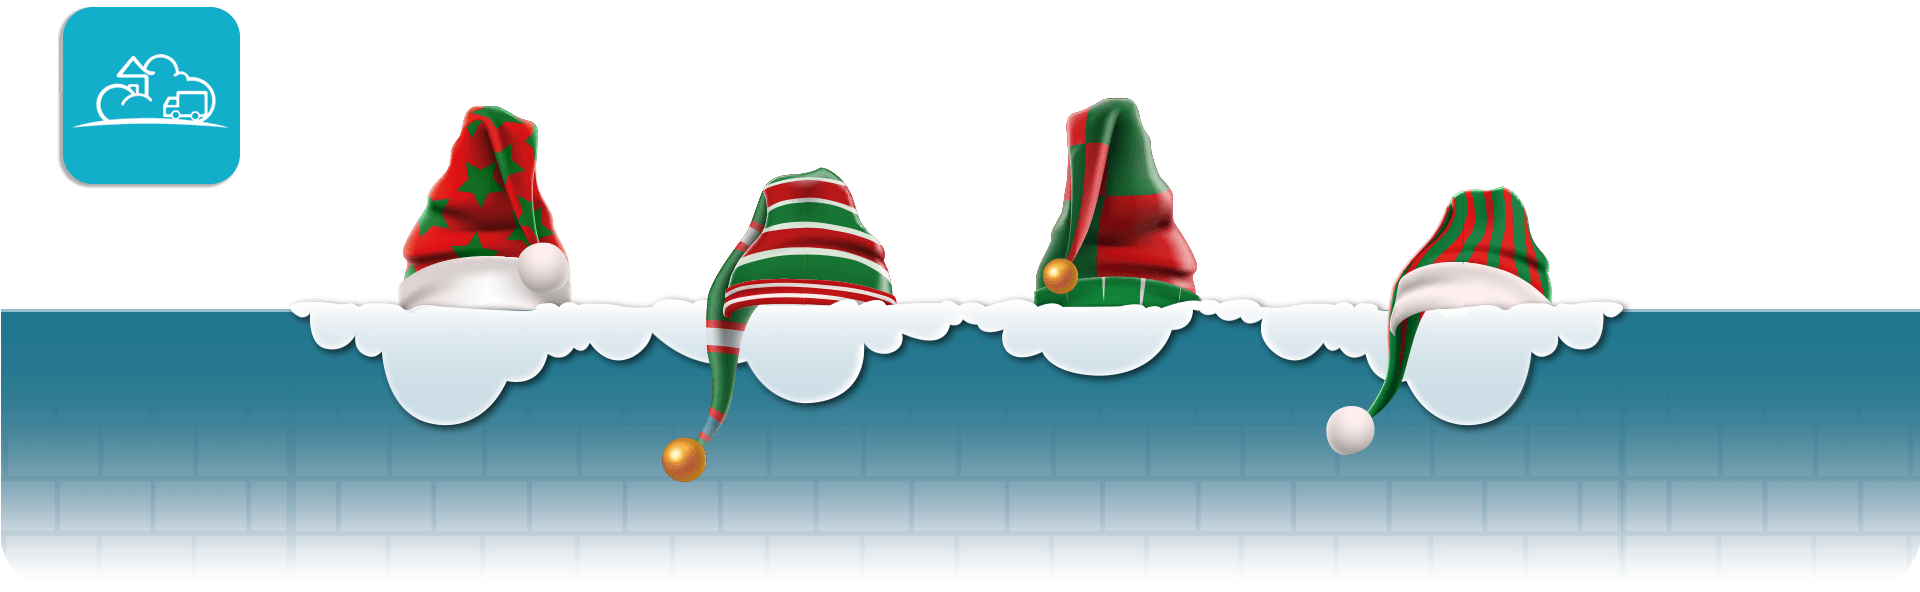 elf hats on a snowy wall